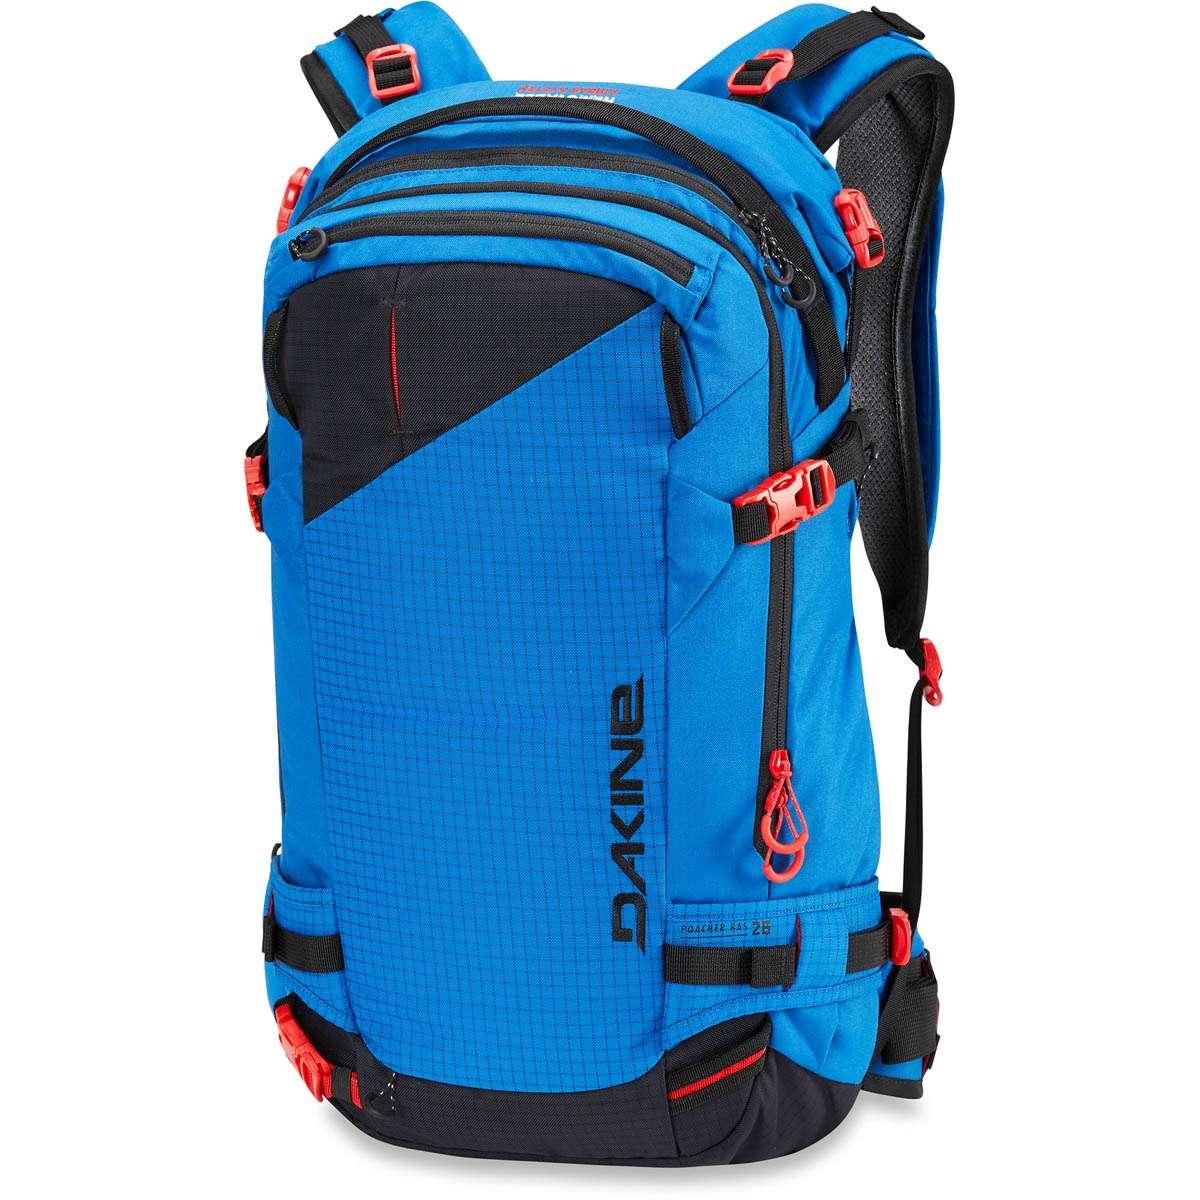 5ce281089aa7 Dakine Poacher RAS 26L Avalanche Backpack Scout